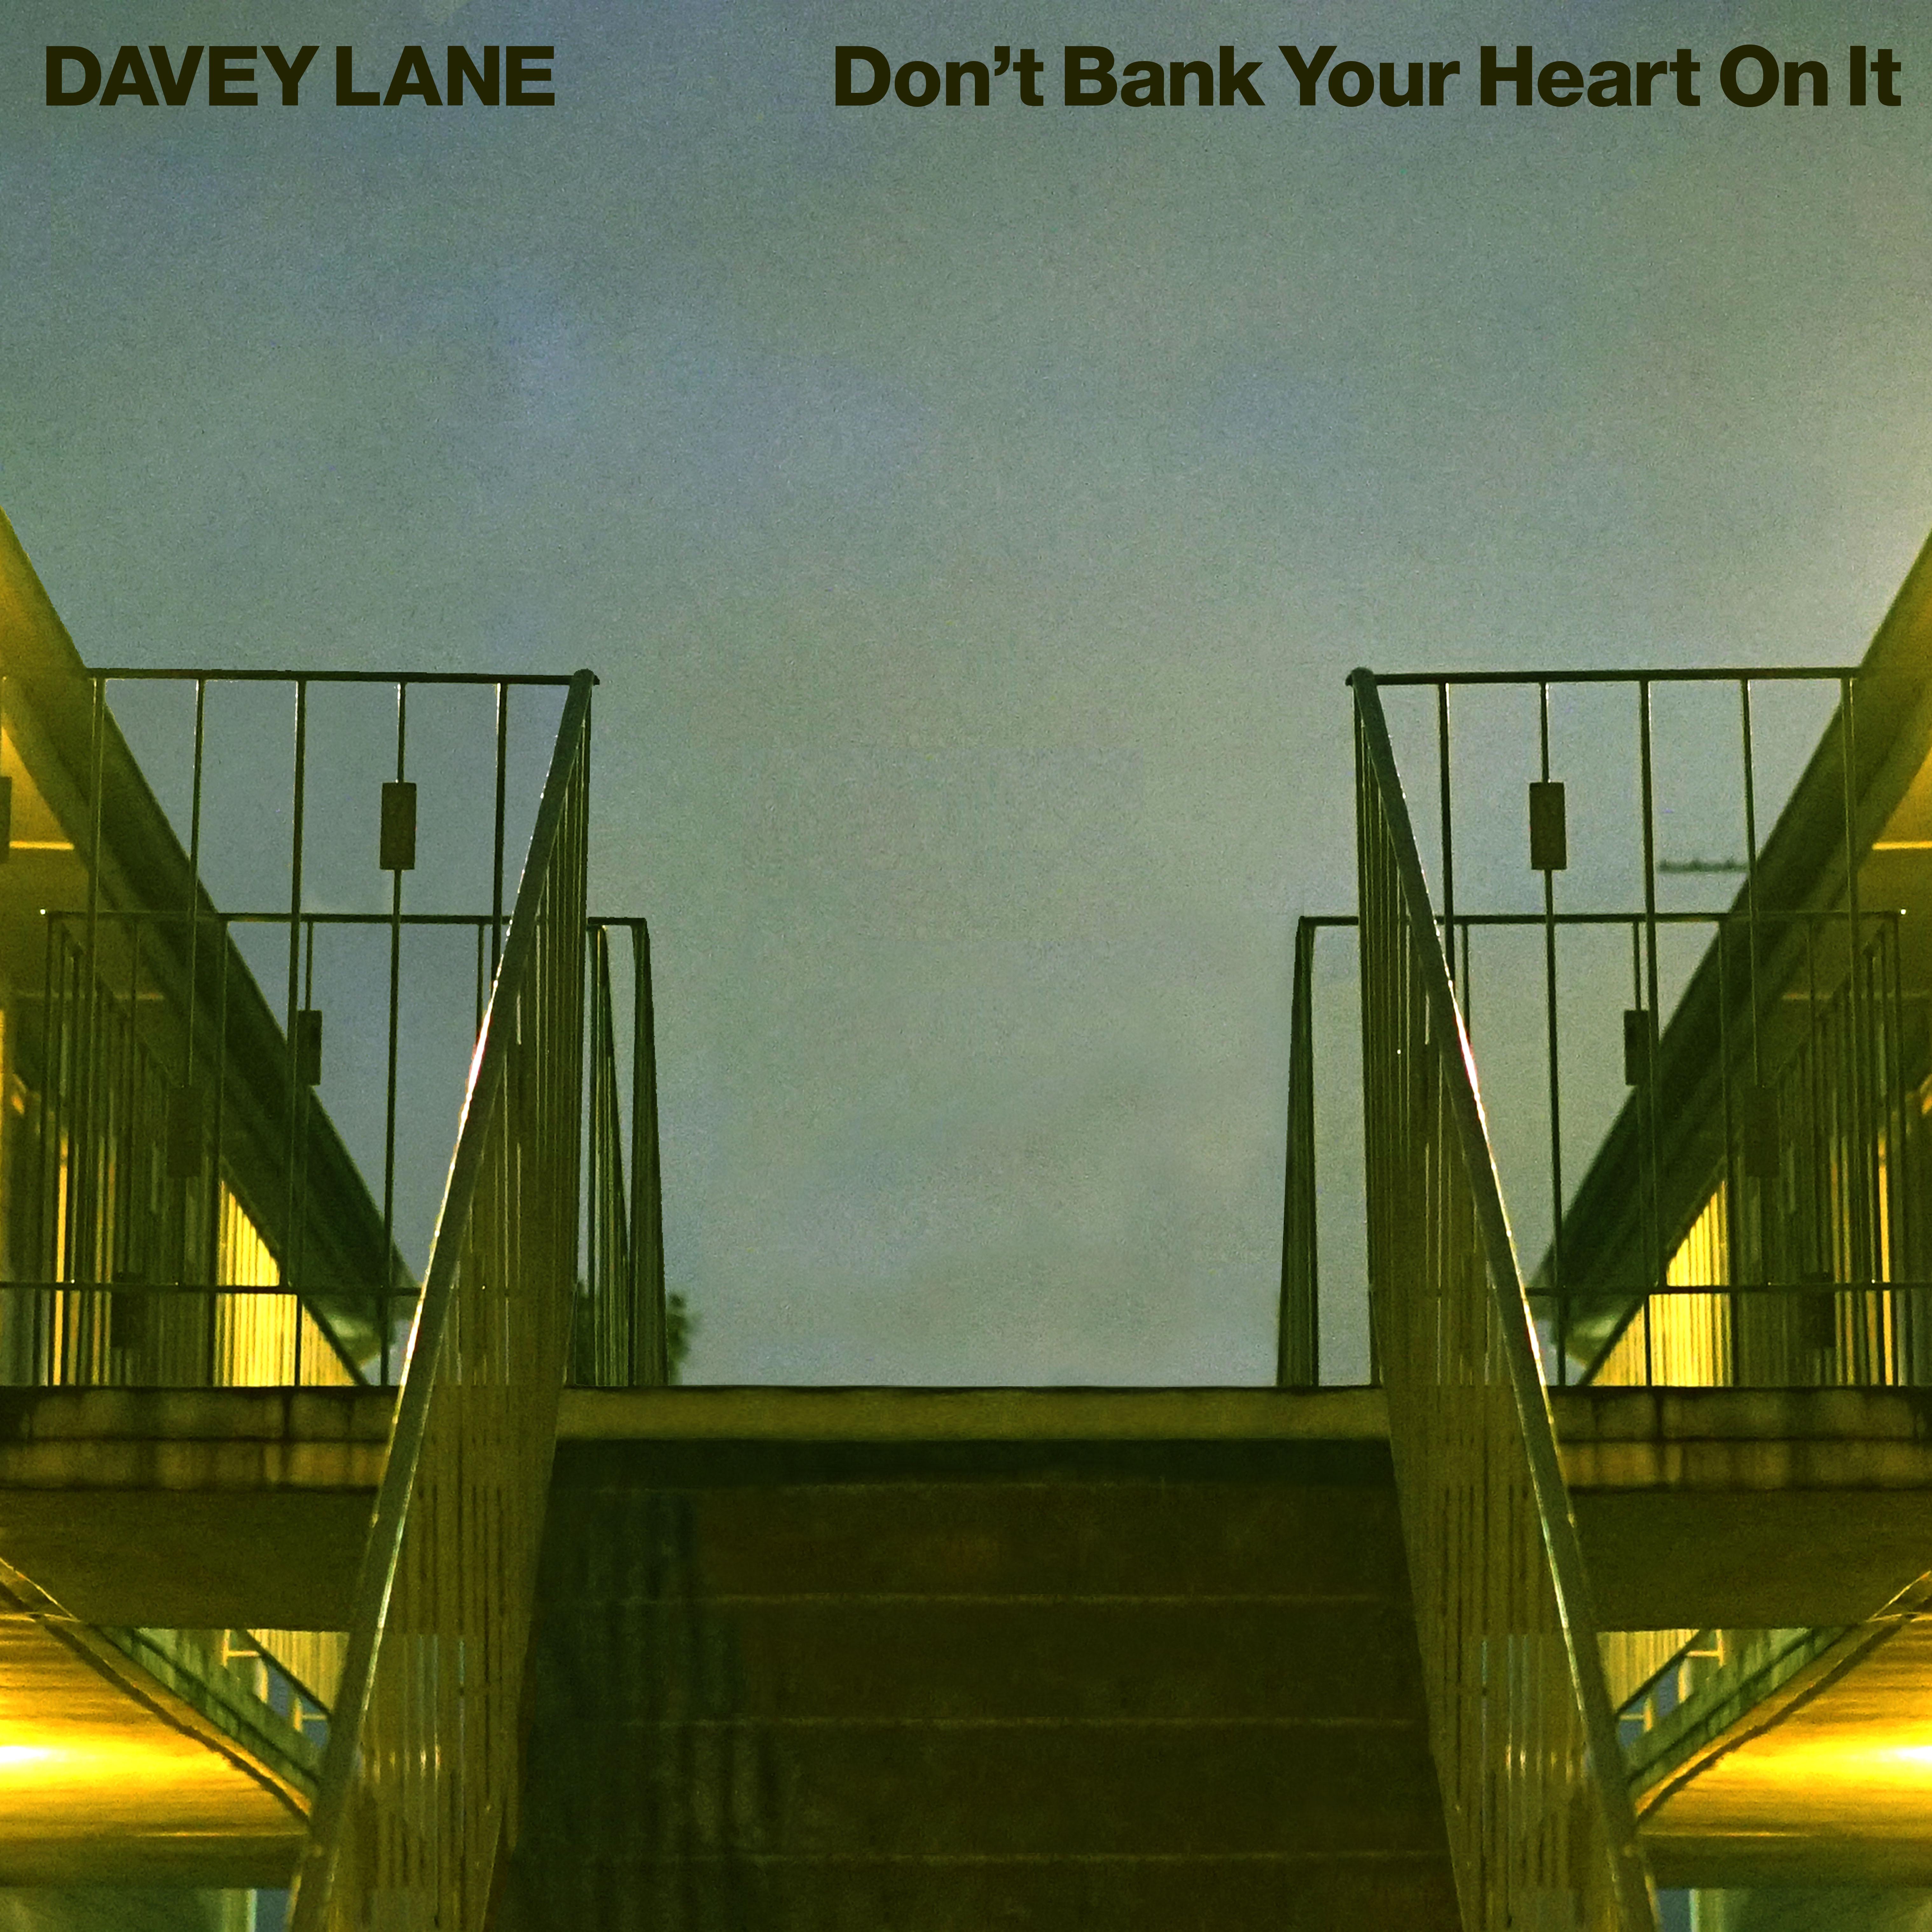 Don't Bank Your Heart On It - 12' vinyl record - Black Vinyl